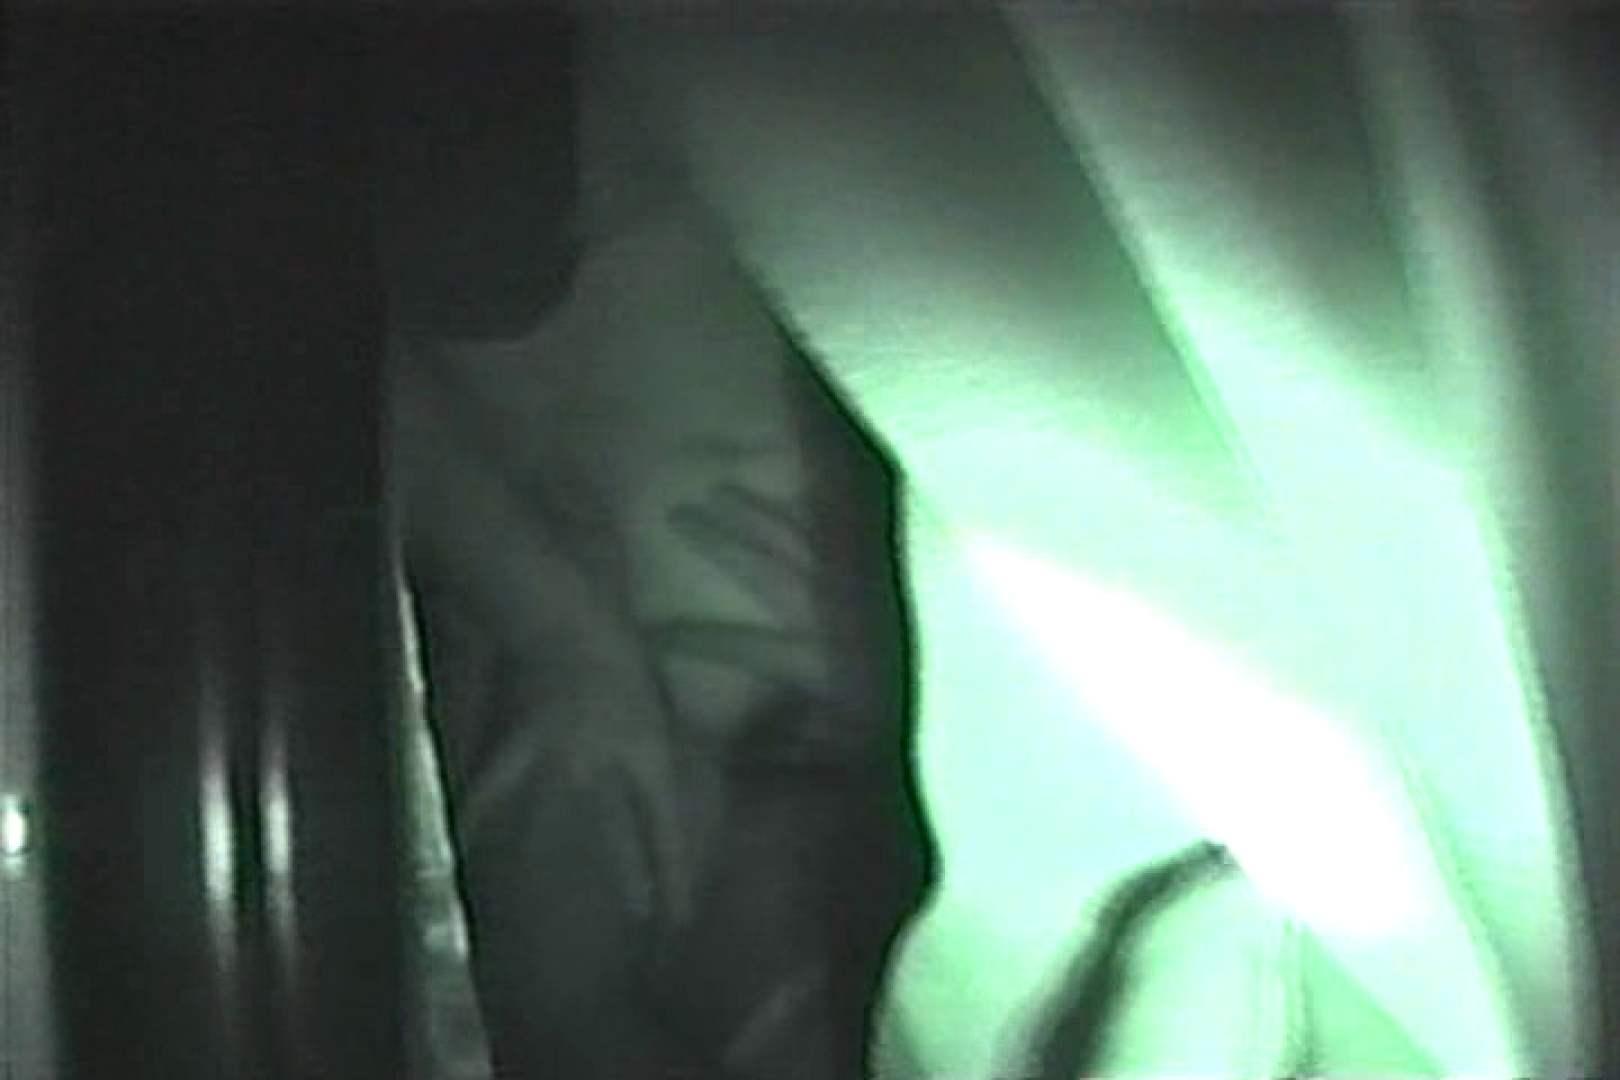 MASAさんの待ち伏せ撮り! 赤外線カーセックスVol.11 喘ぎオンナ 盗撮えろ無修正画像 86pic 44